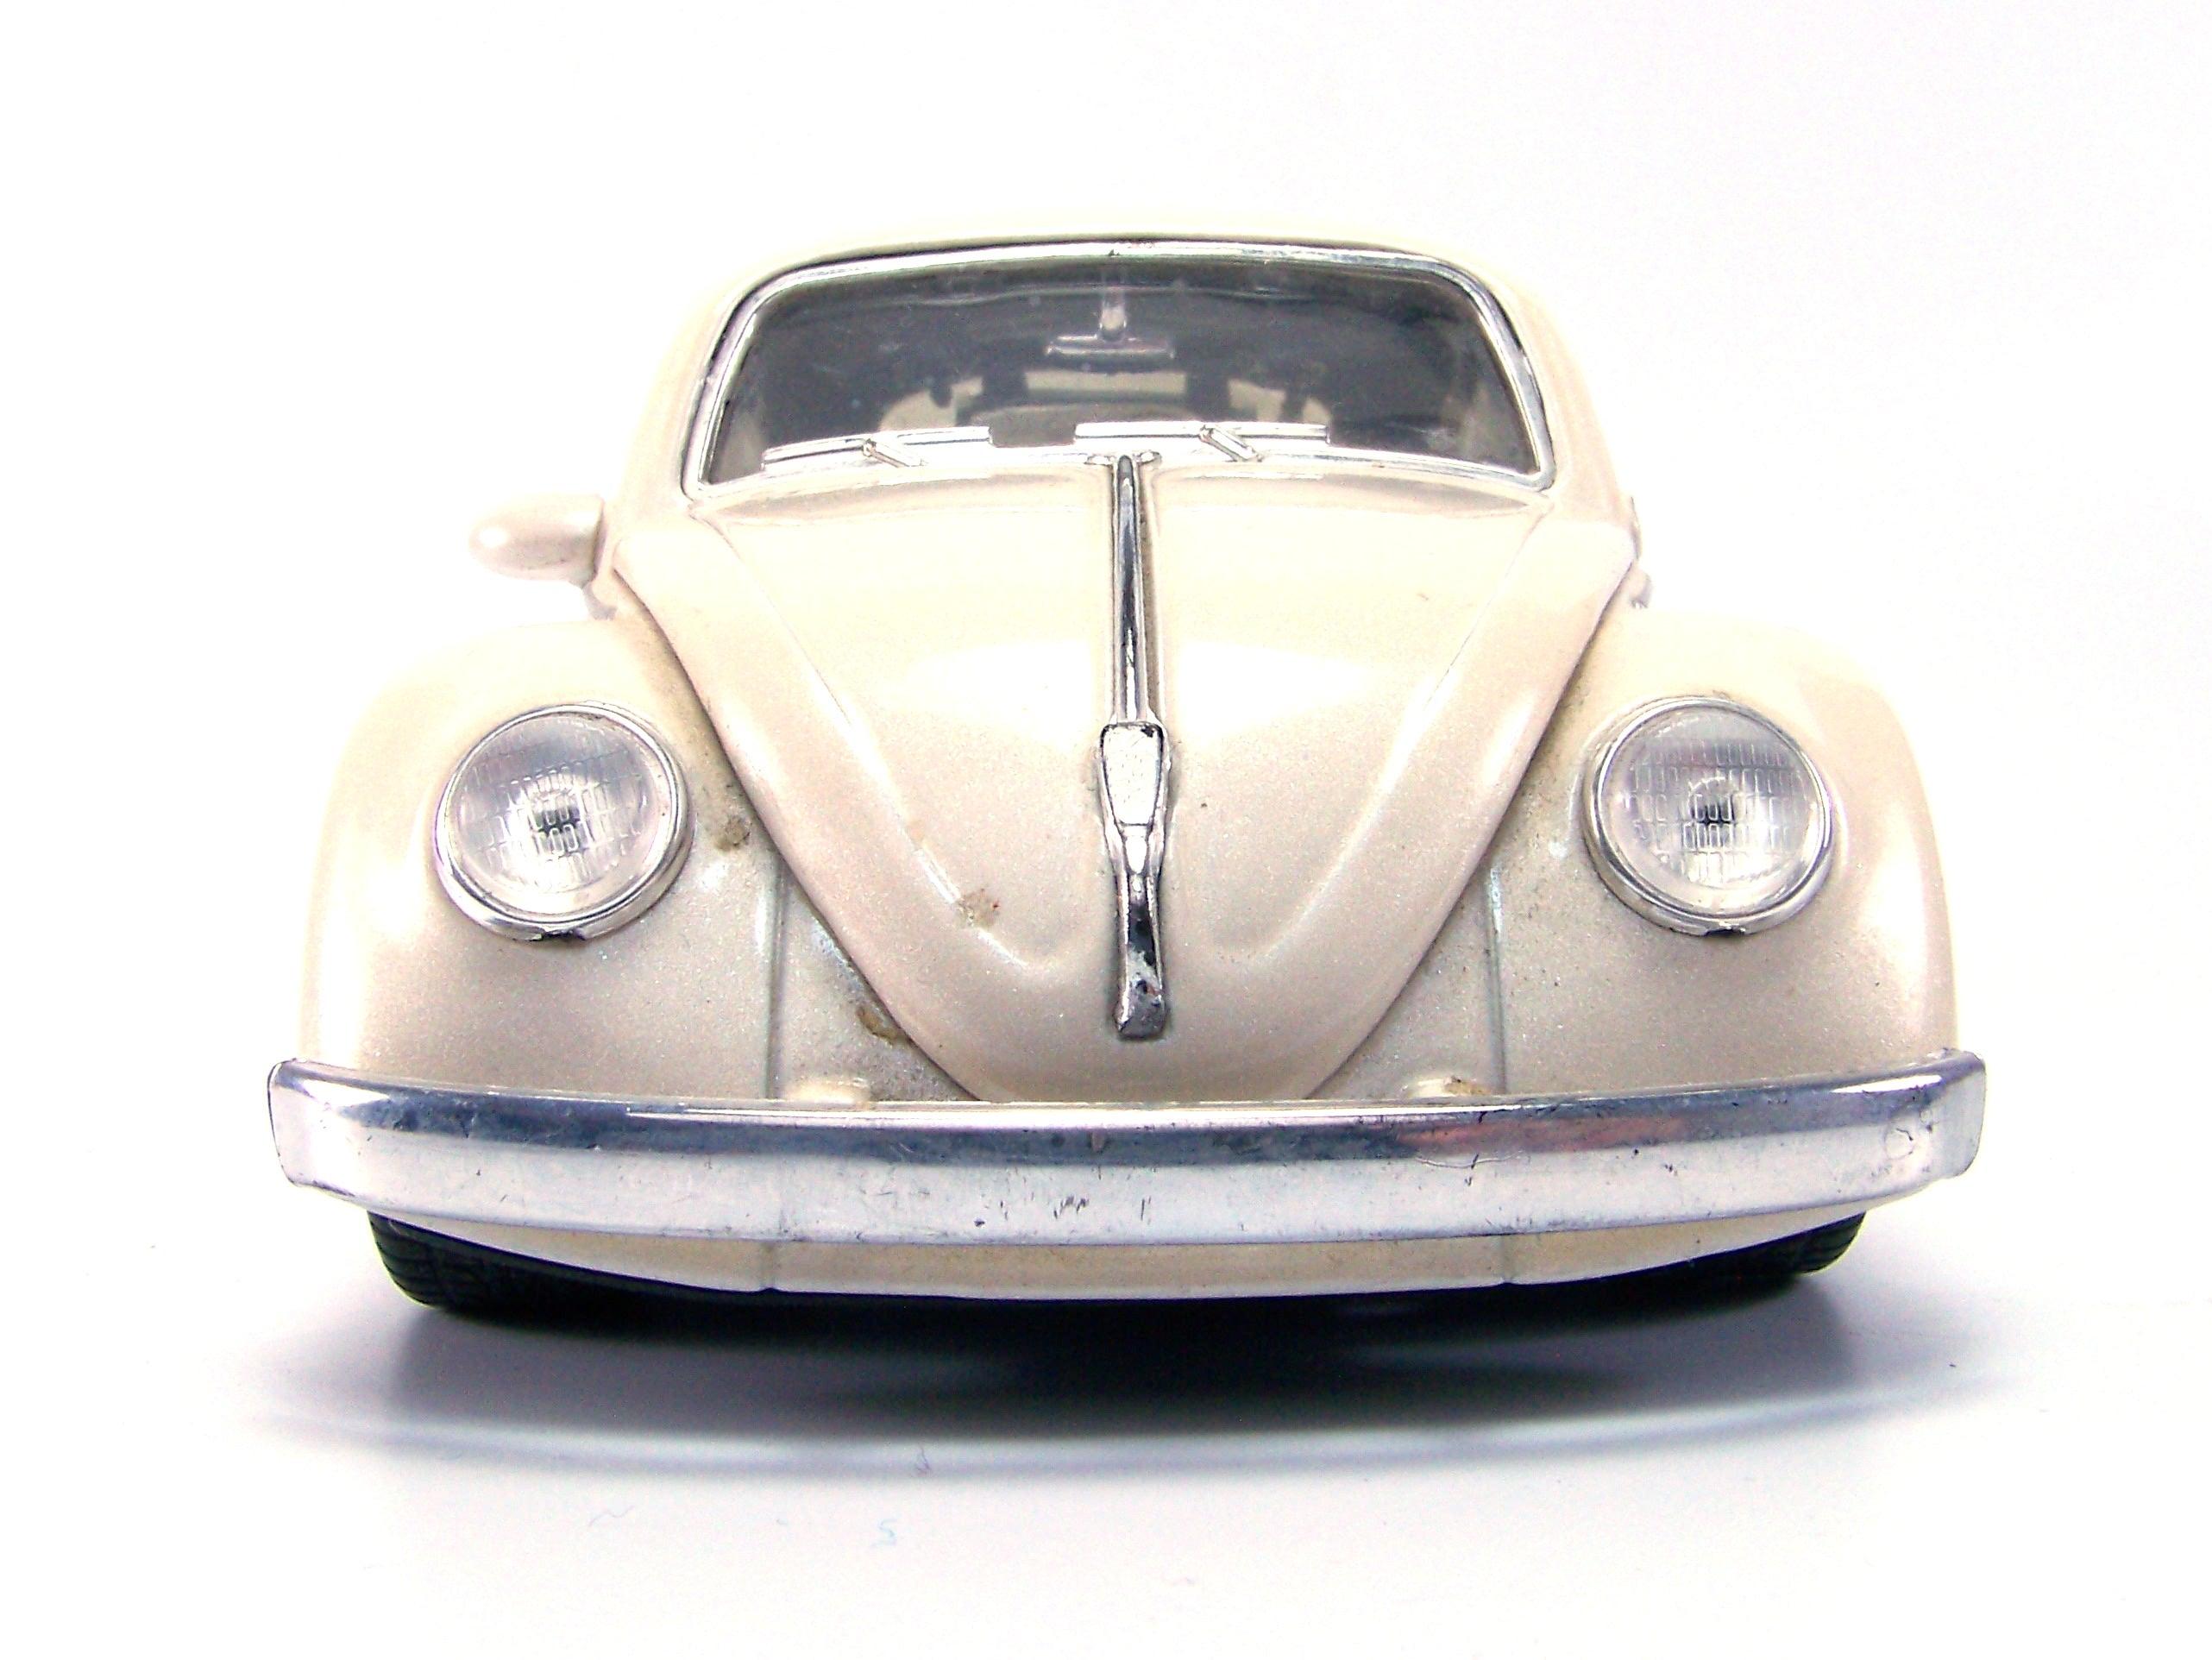 Toy car, Auto, Vw, Volkswagen, Vintage, HQ Photo